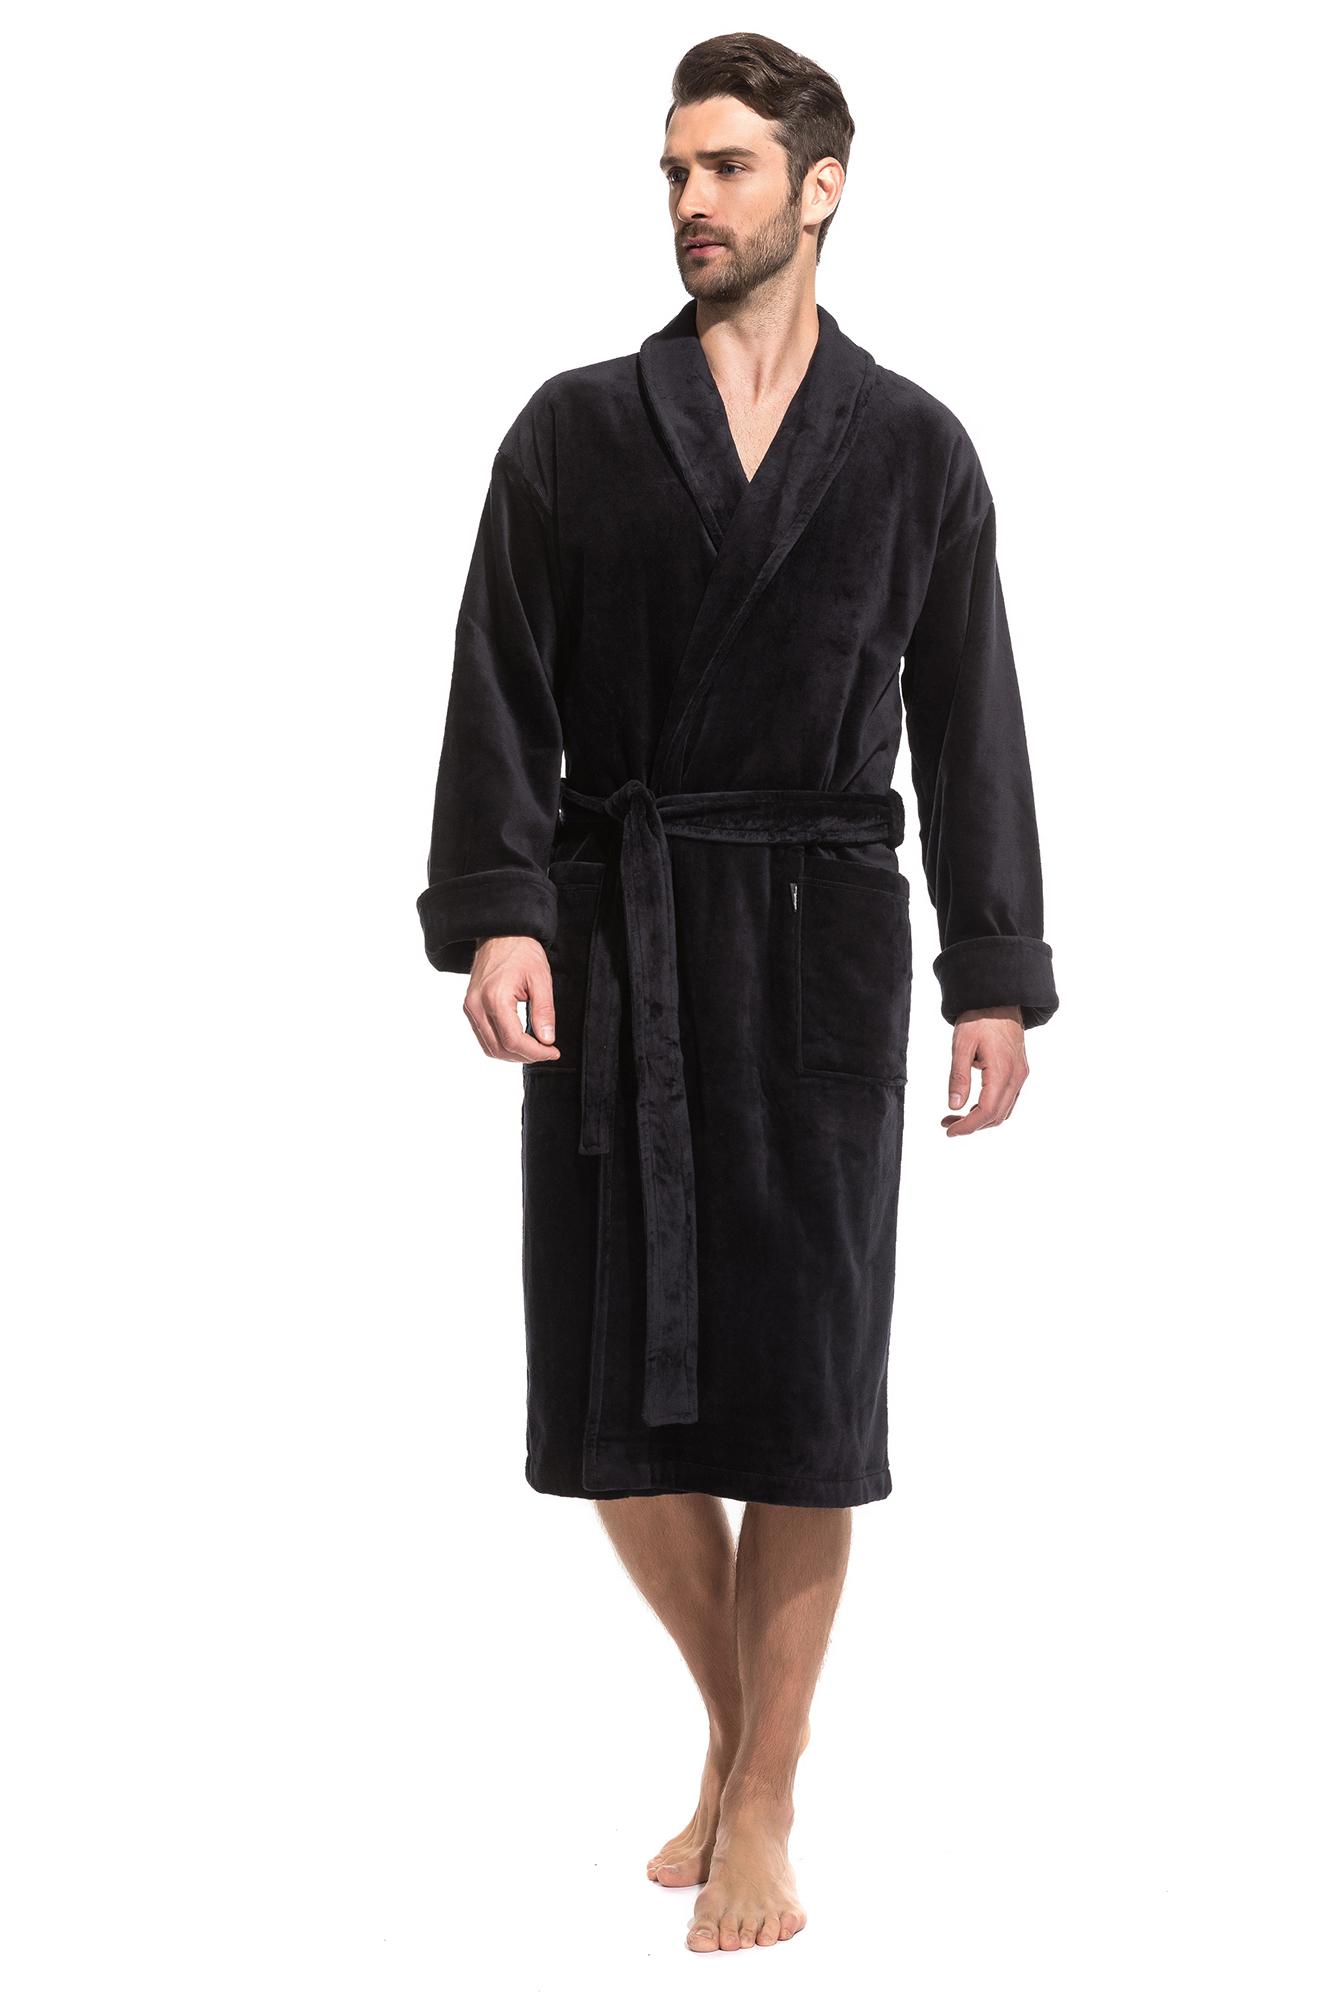 Домашний халат Eleanor Цвет: Черный (52-54) Peche Monnaie pmn665505